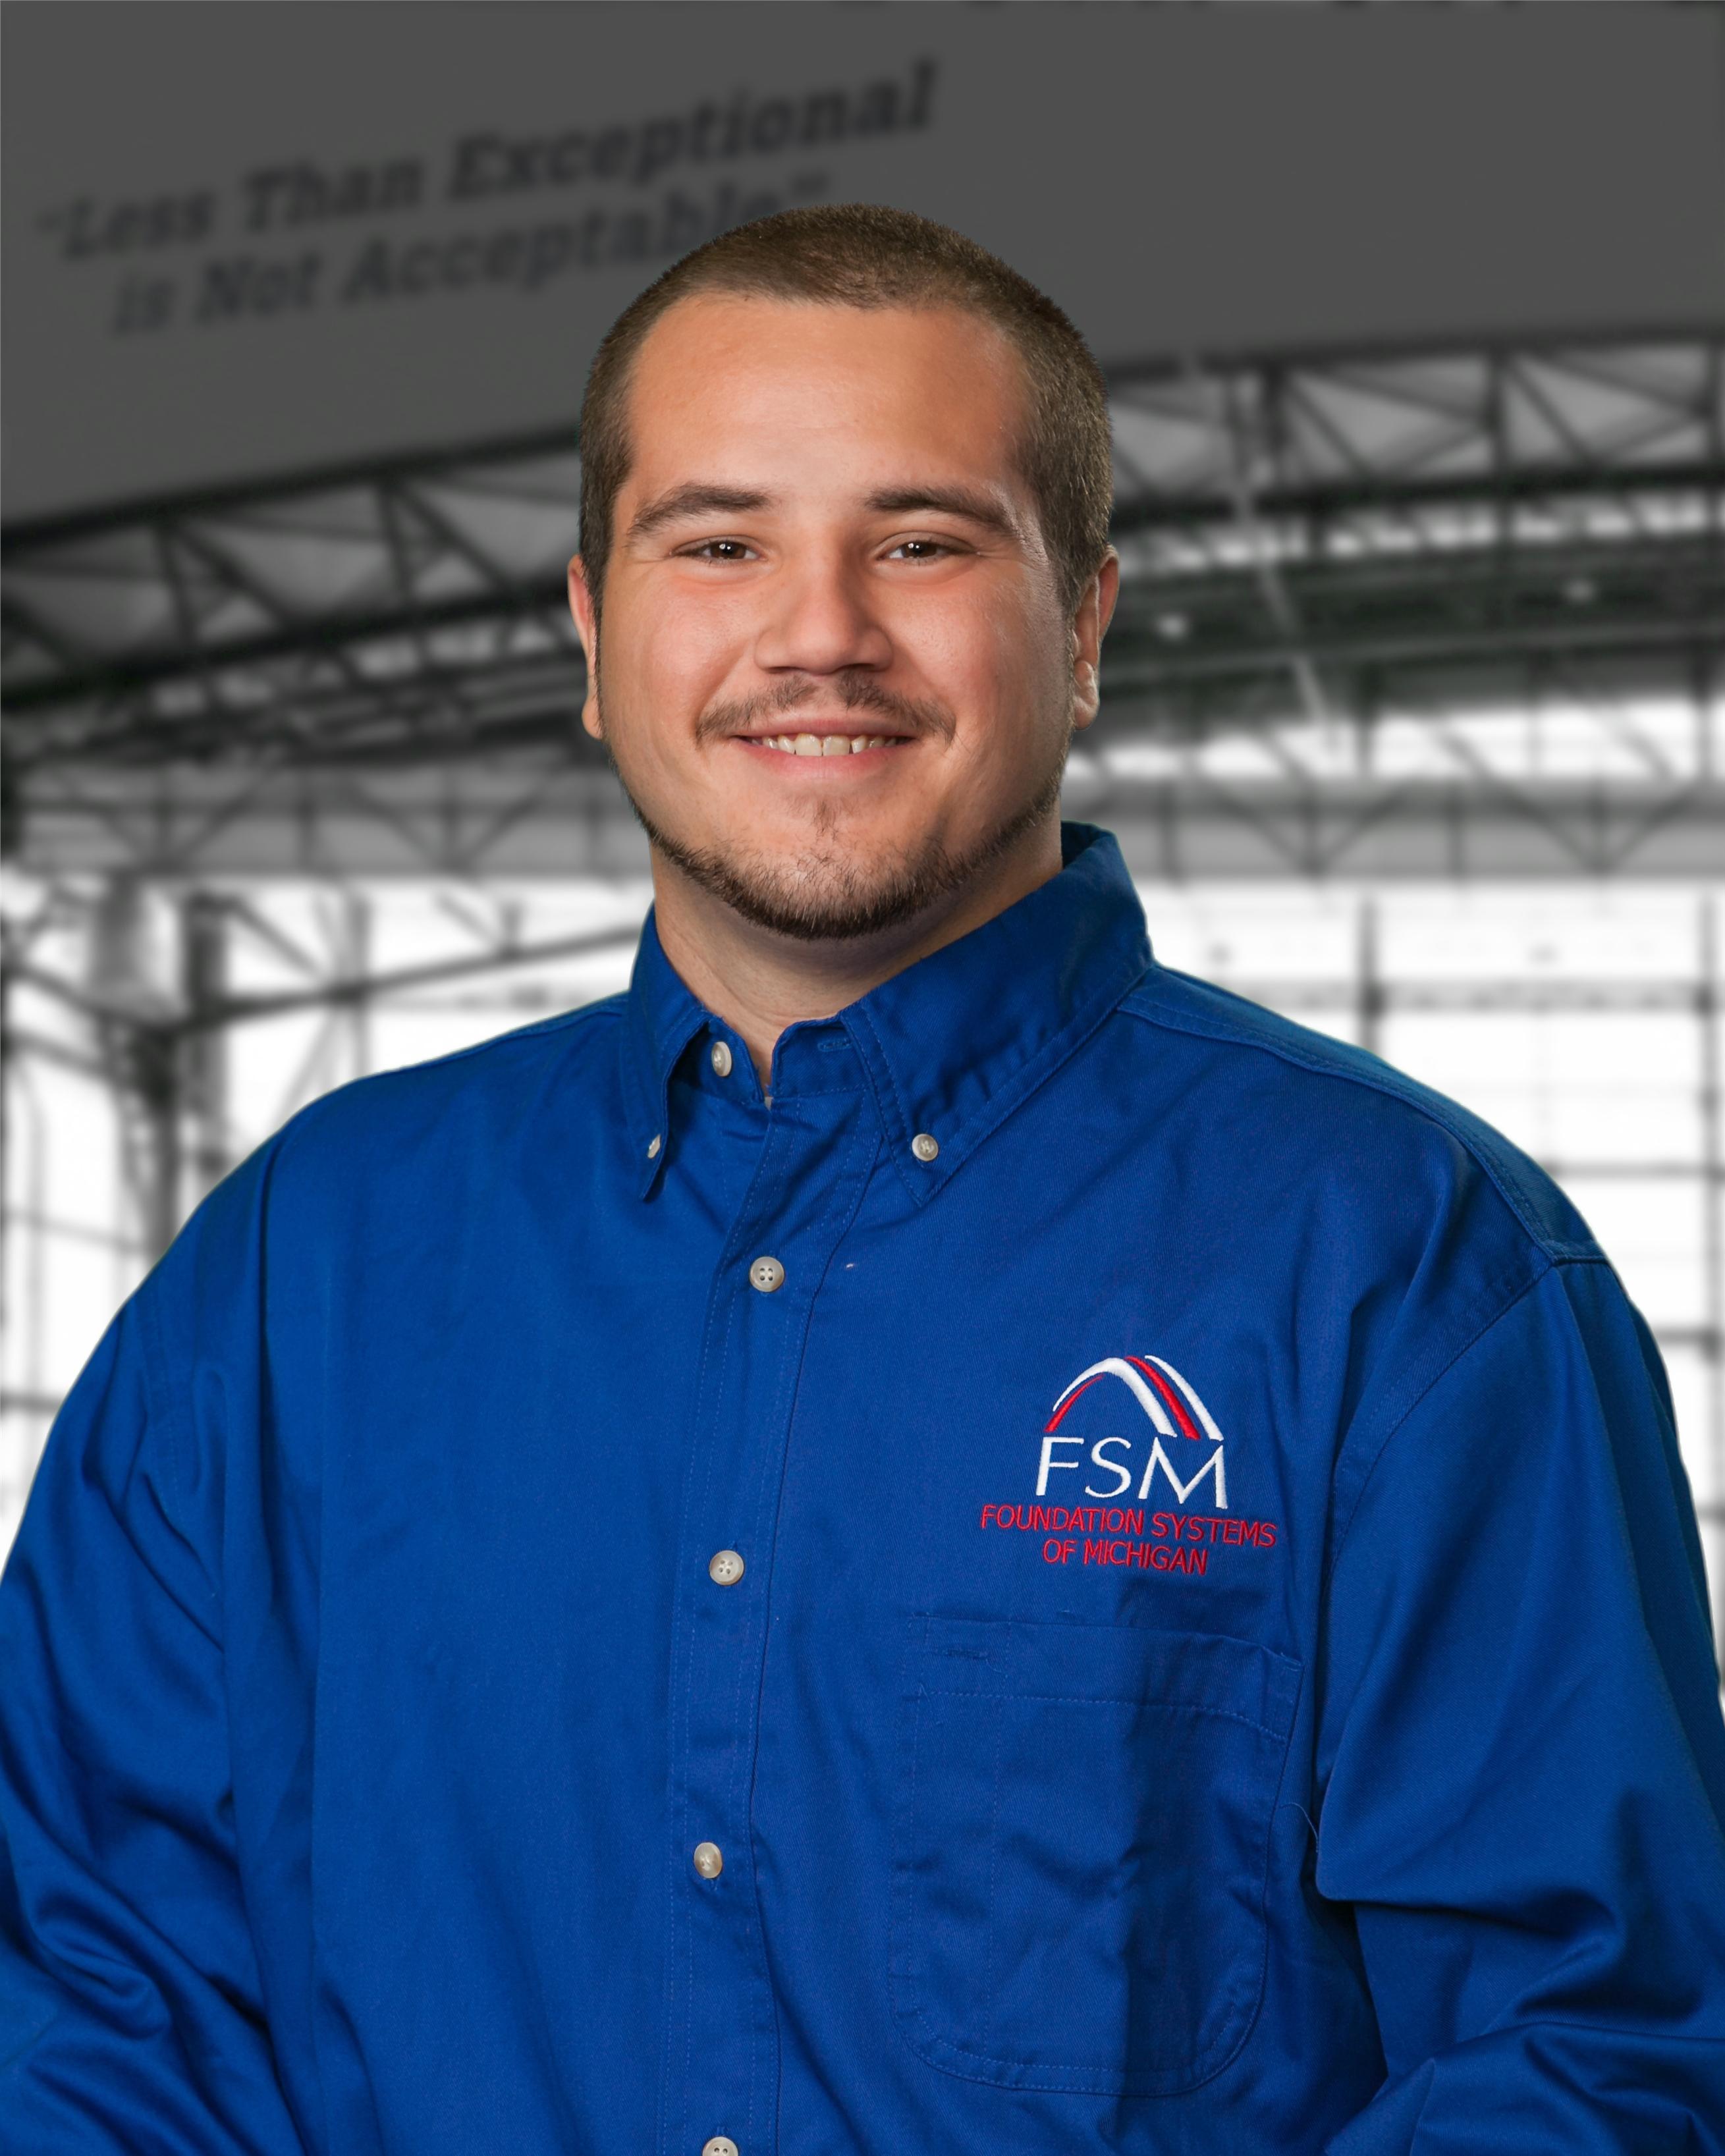 FSM Alex Hood Foreman